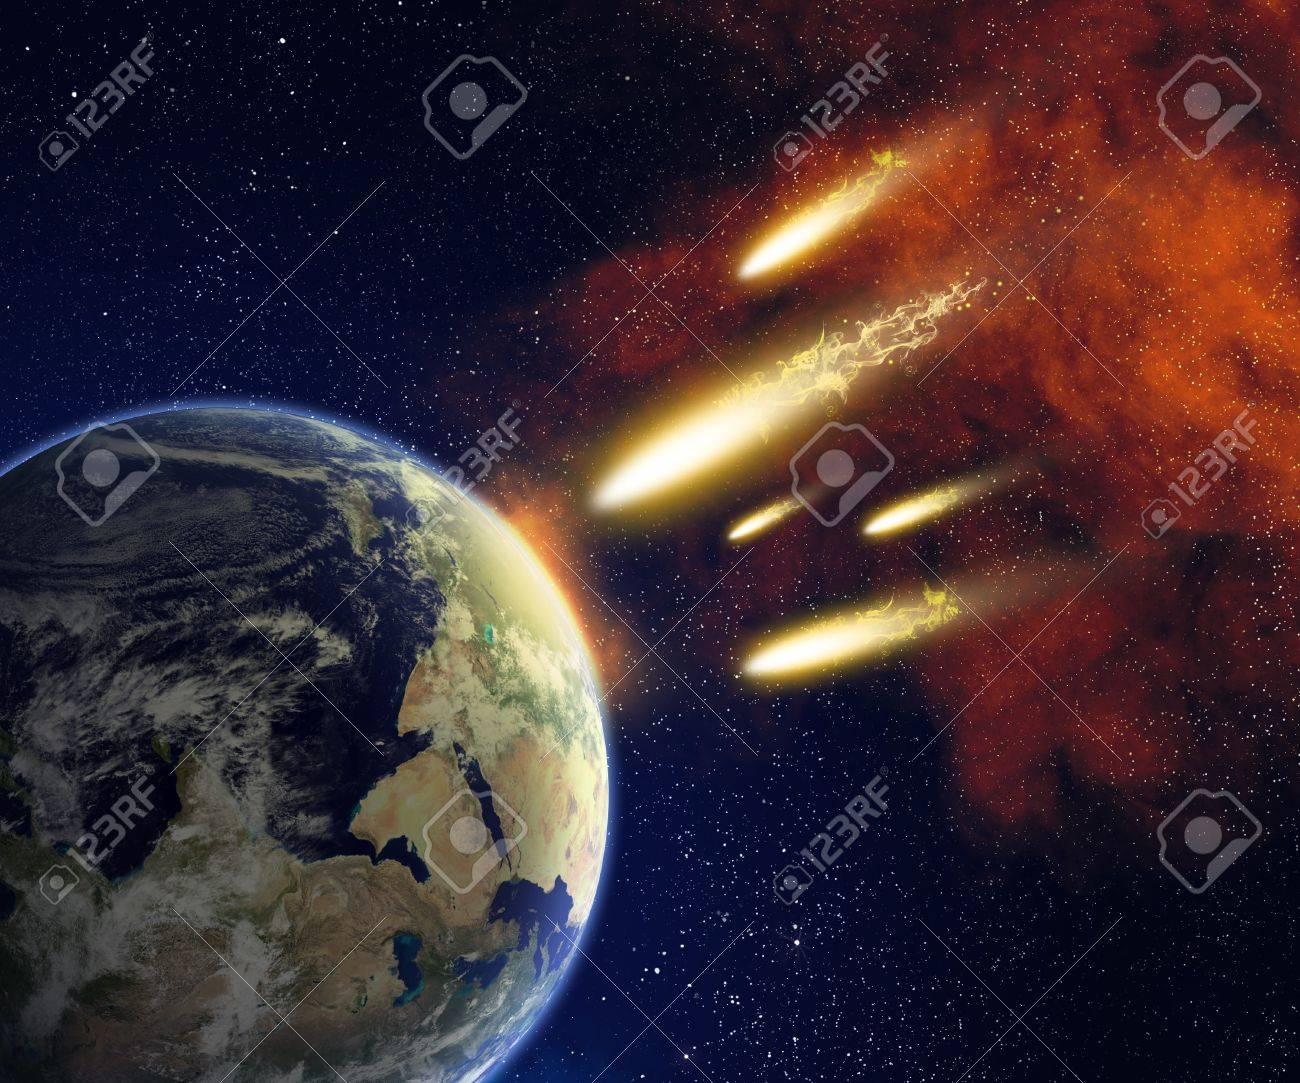 В космосе летают астероиды equipoise spa new zealand